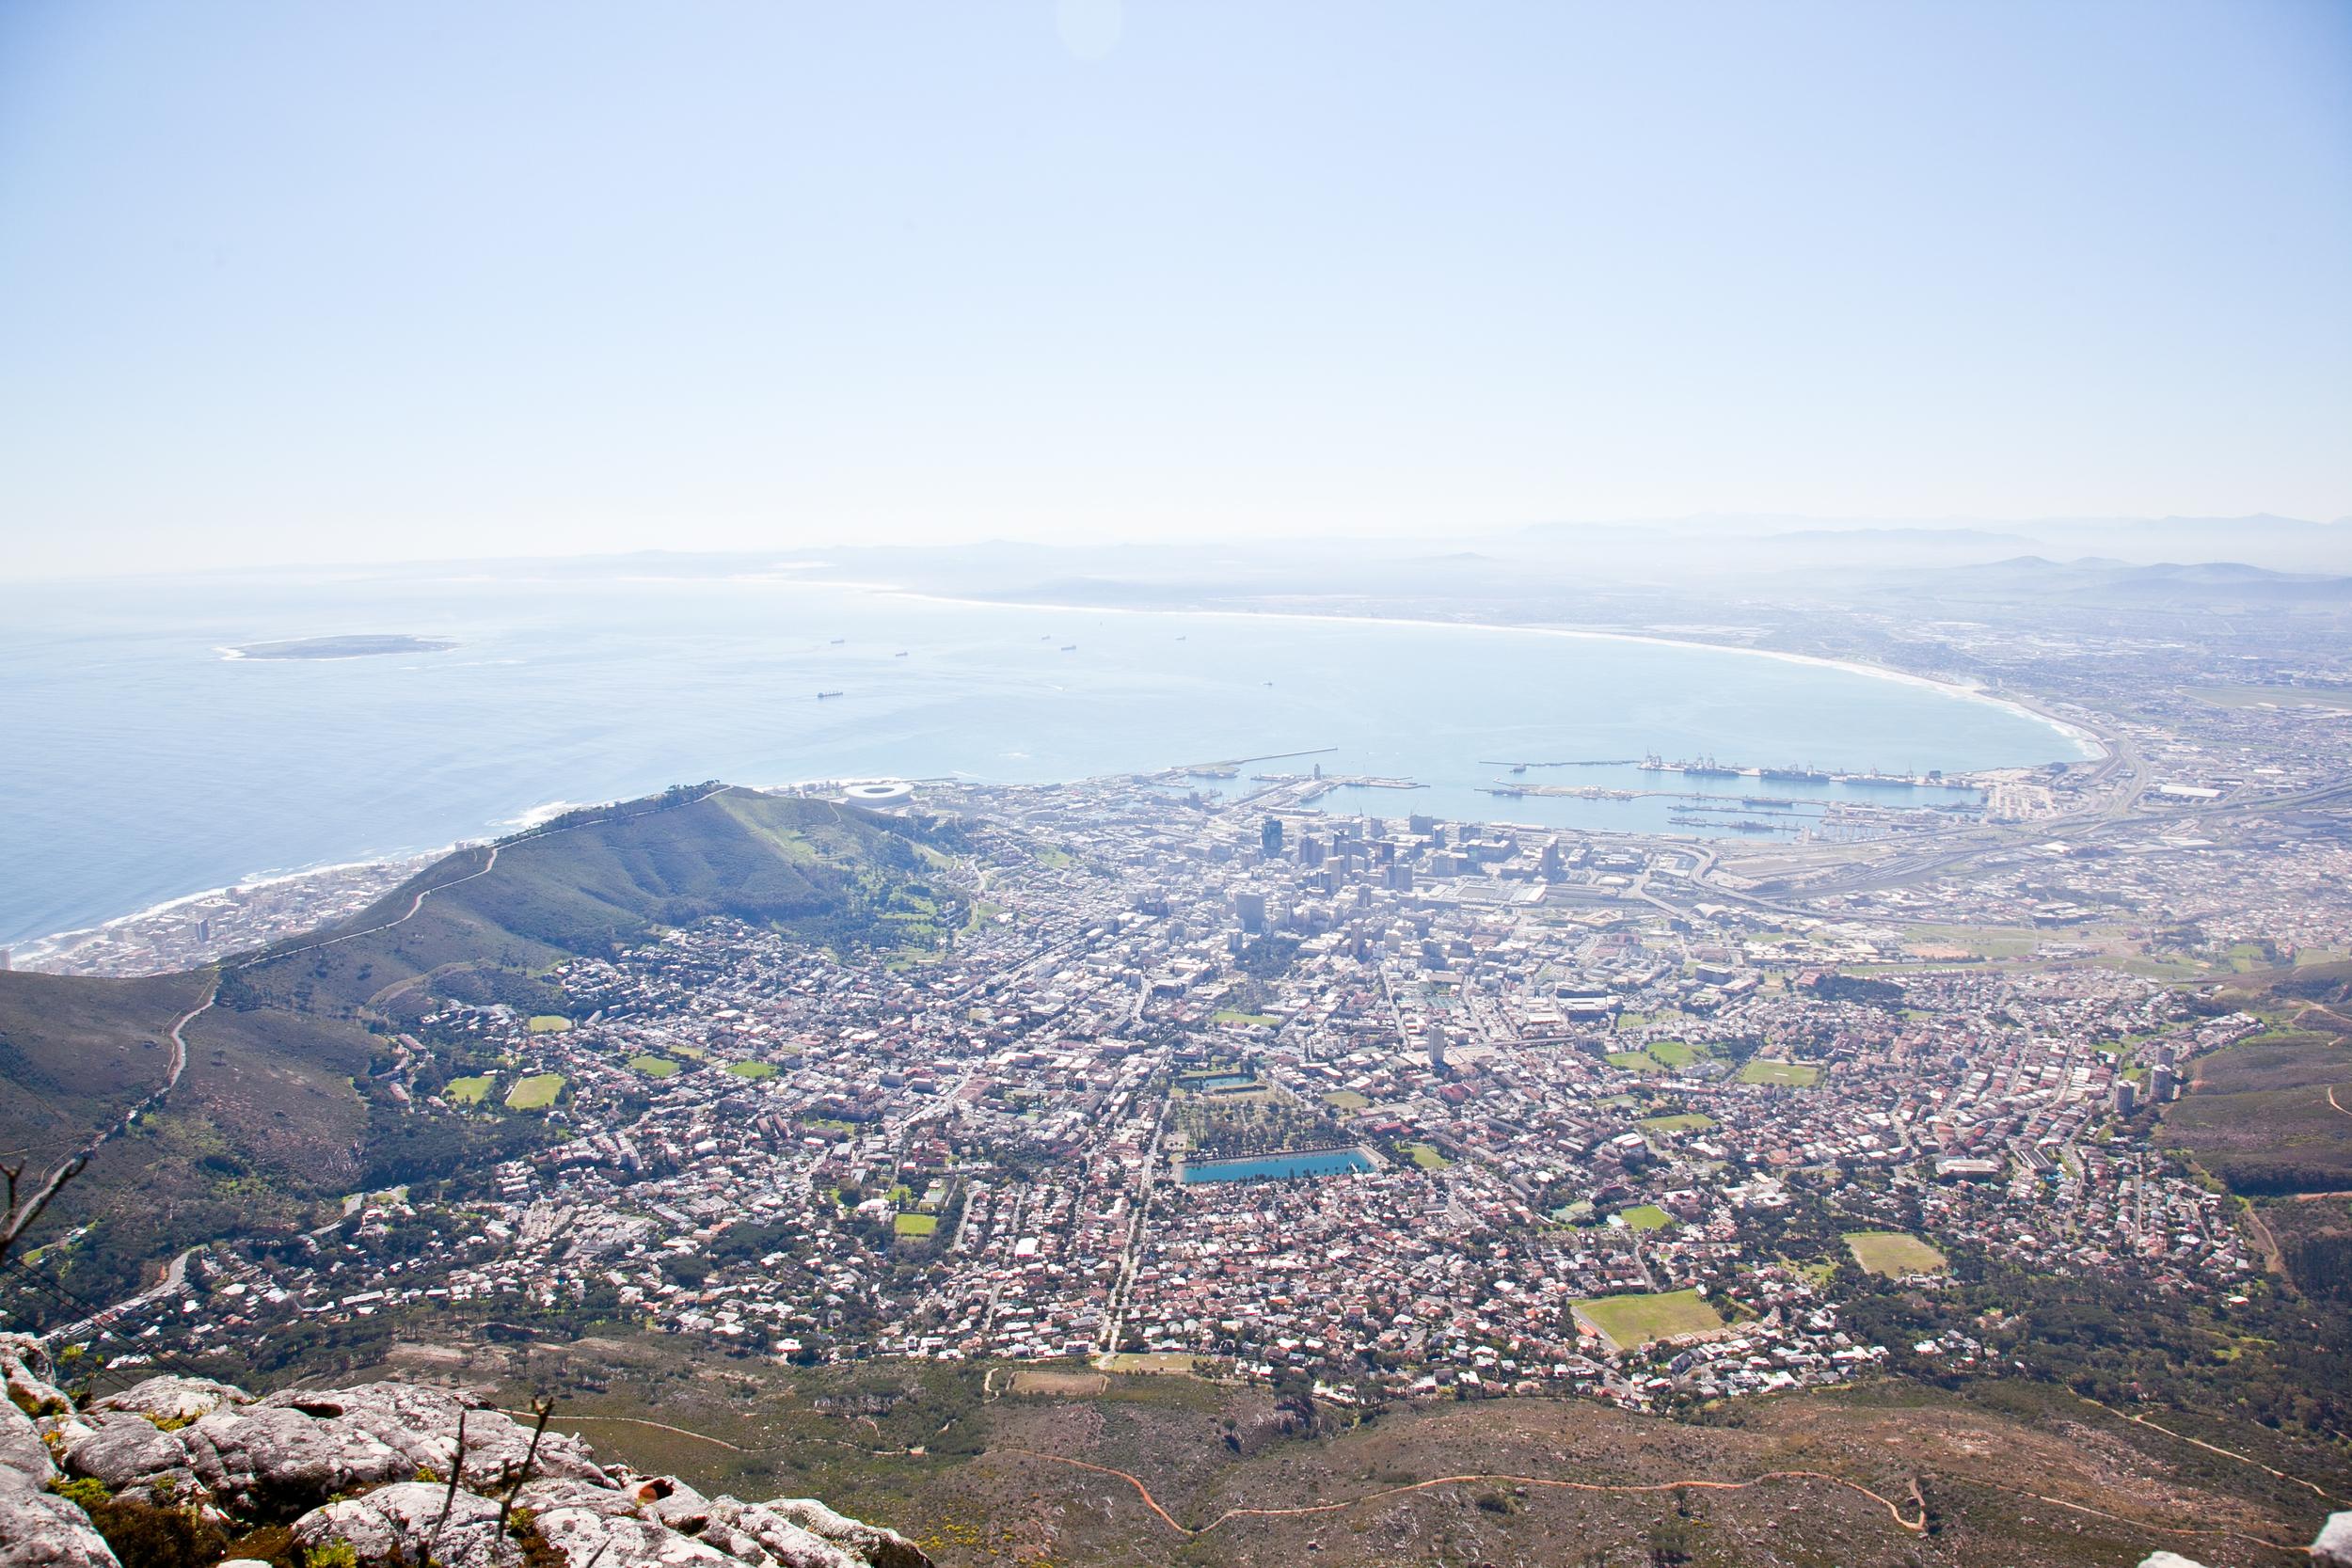 IMG_4654-table-mountain-cape-town-south-africa-trisa-taro.jpg